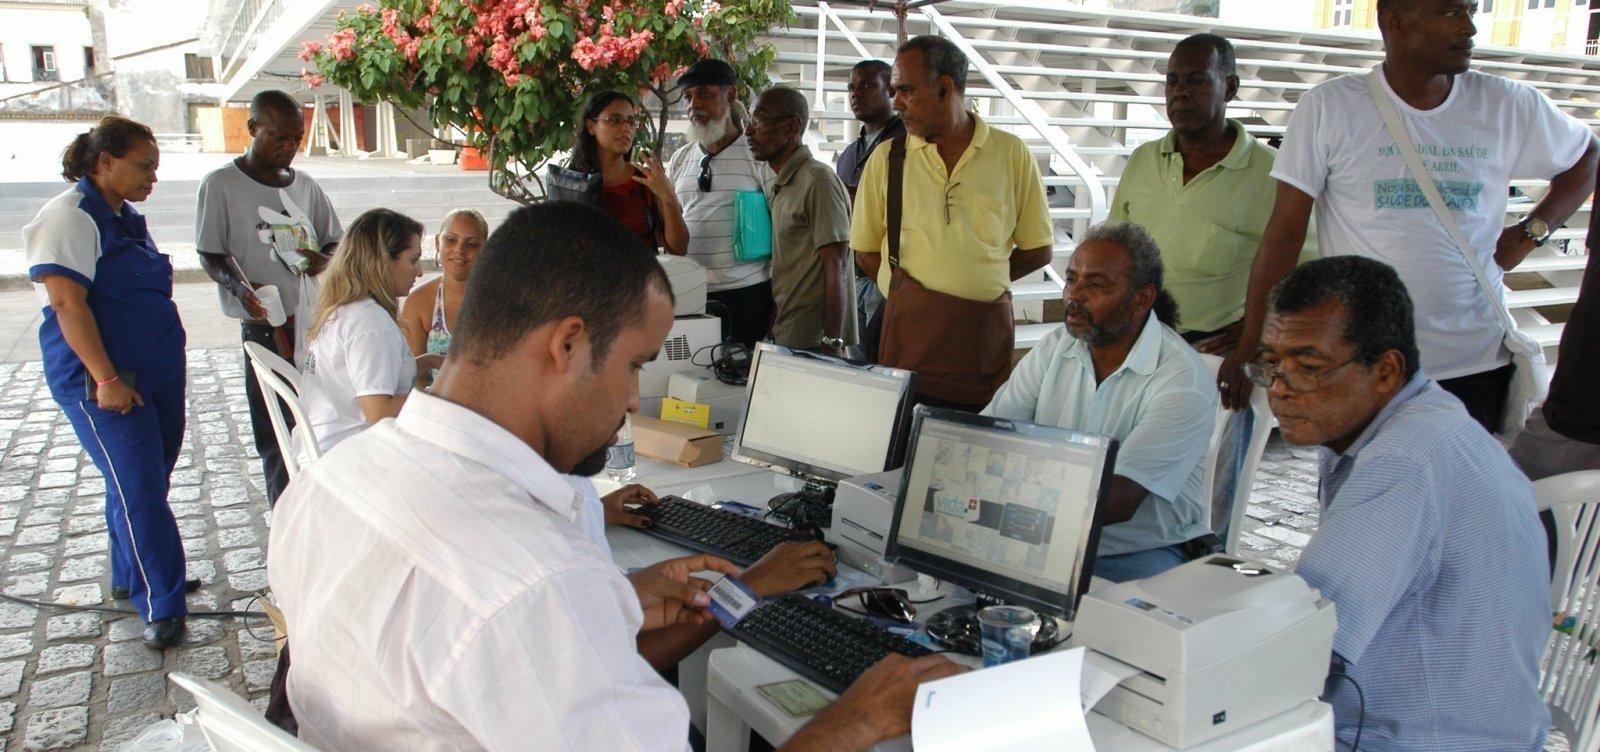 Novembro Negro: Feira de Saúde acontece nesta quinta em Periperi